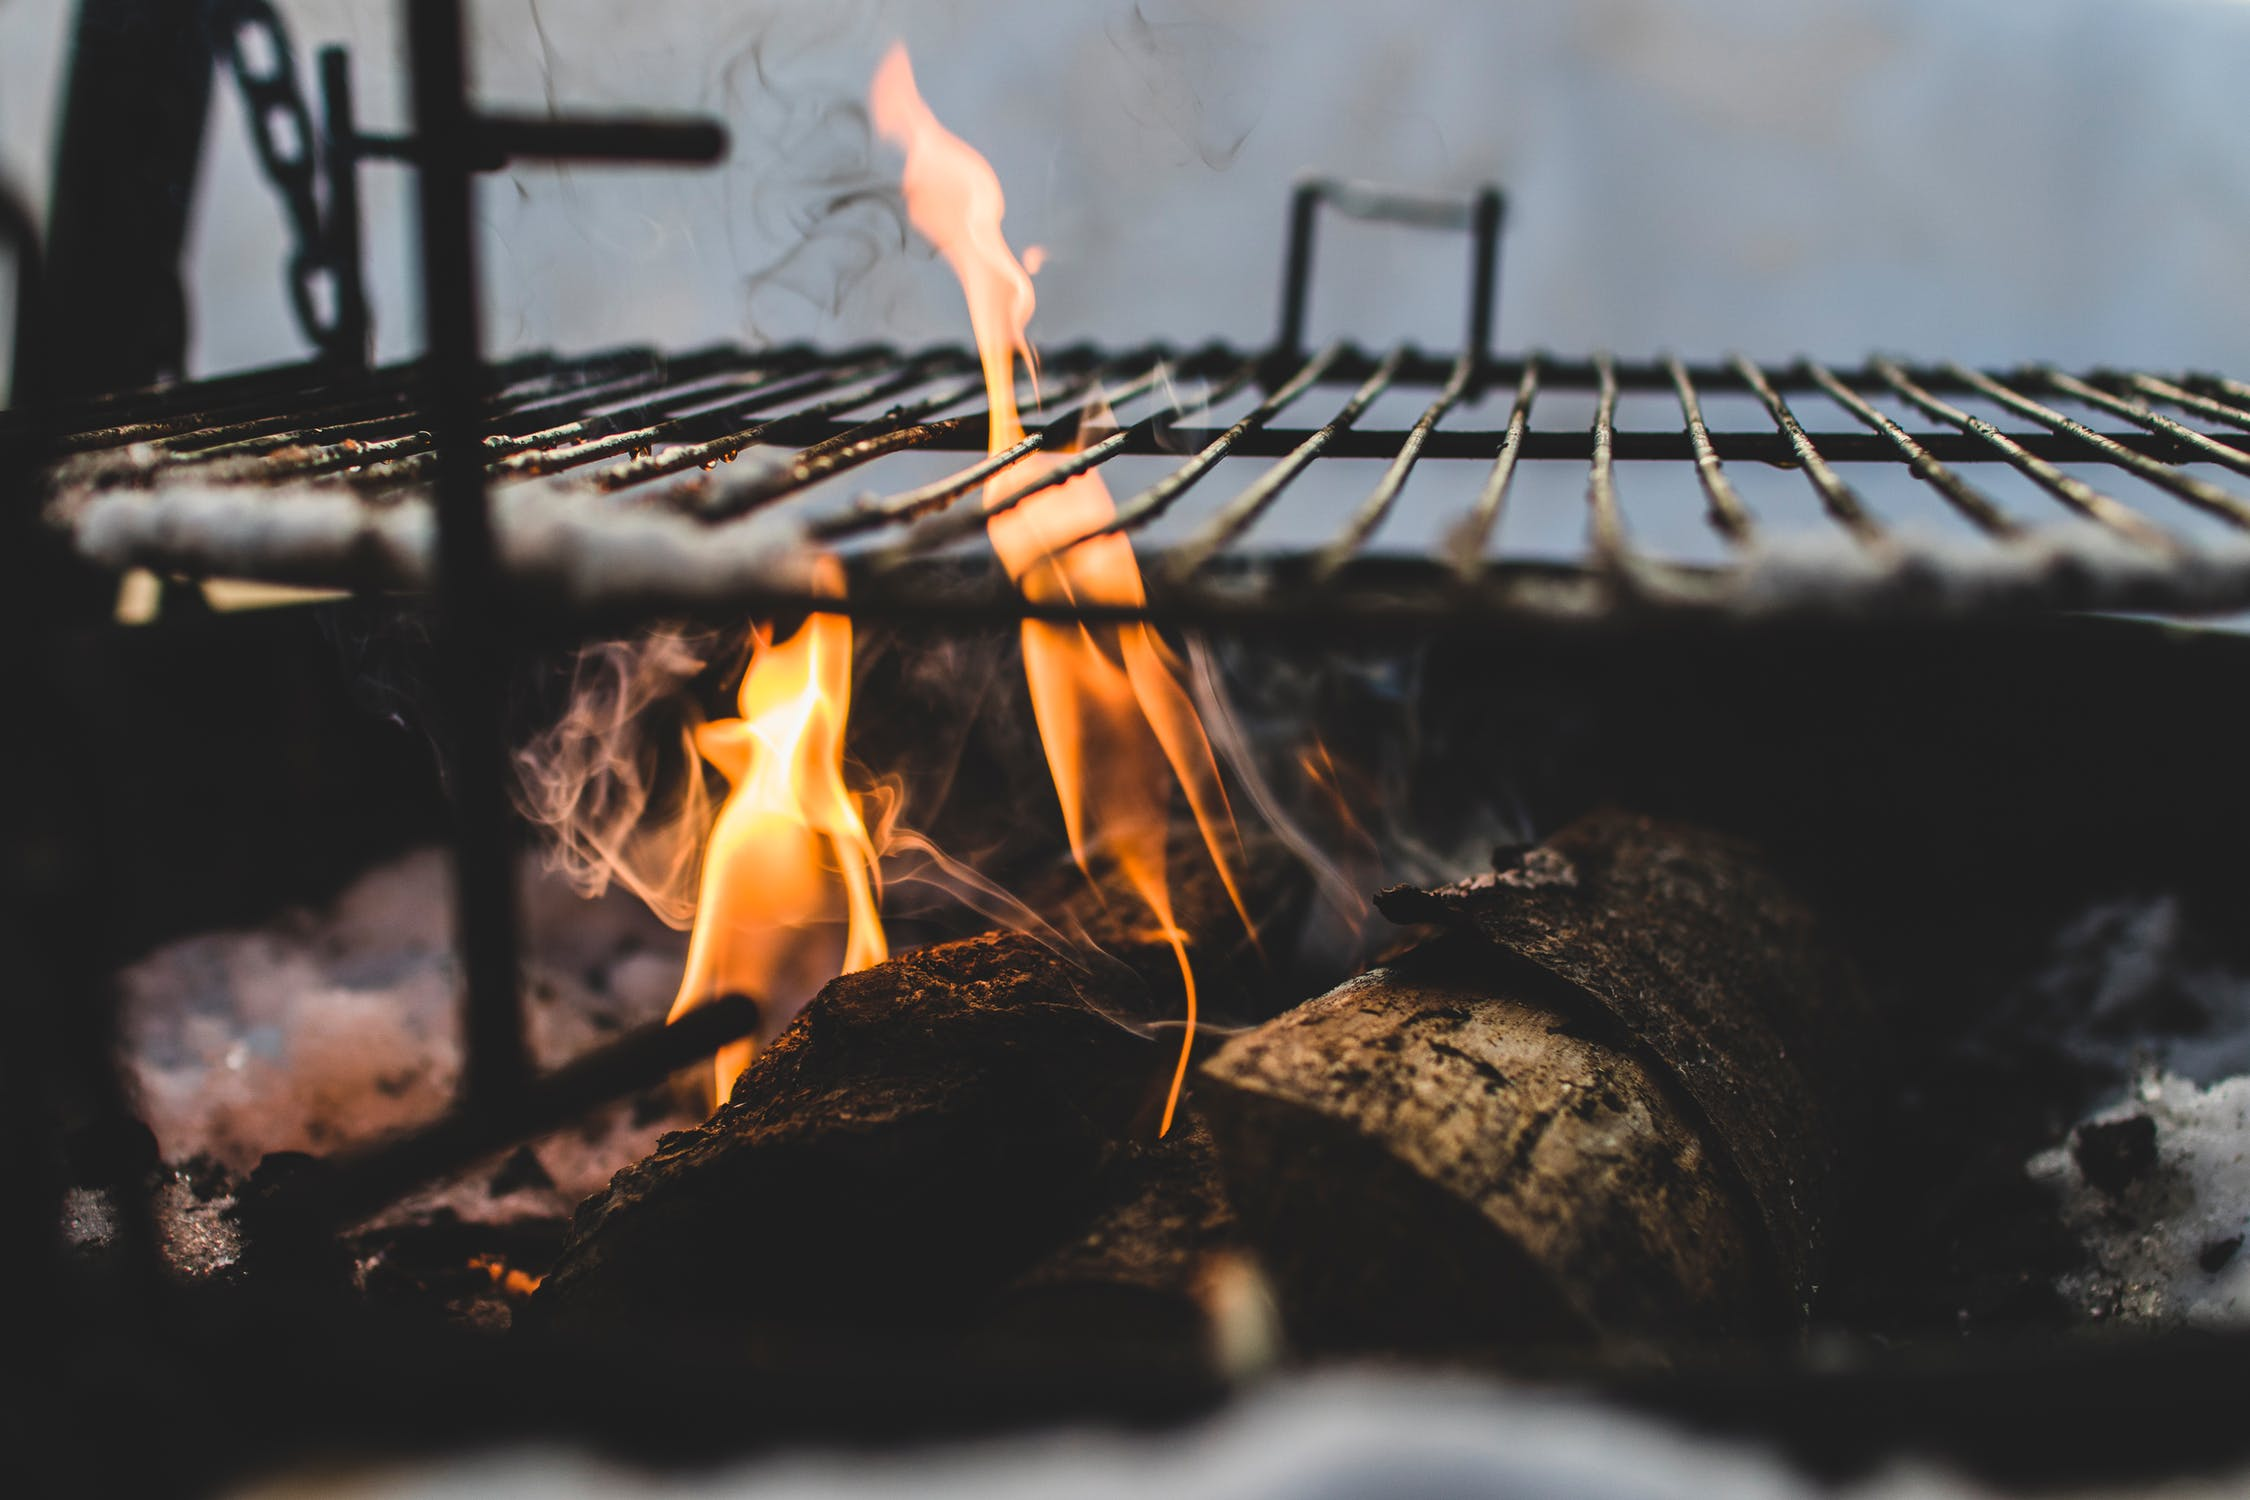 Kiln-Dried Firewood in Jonesboro, GA